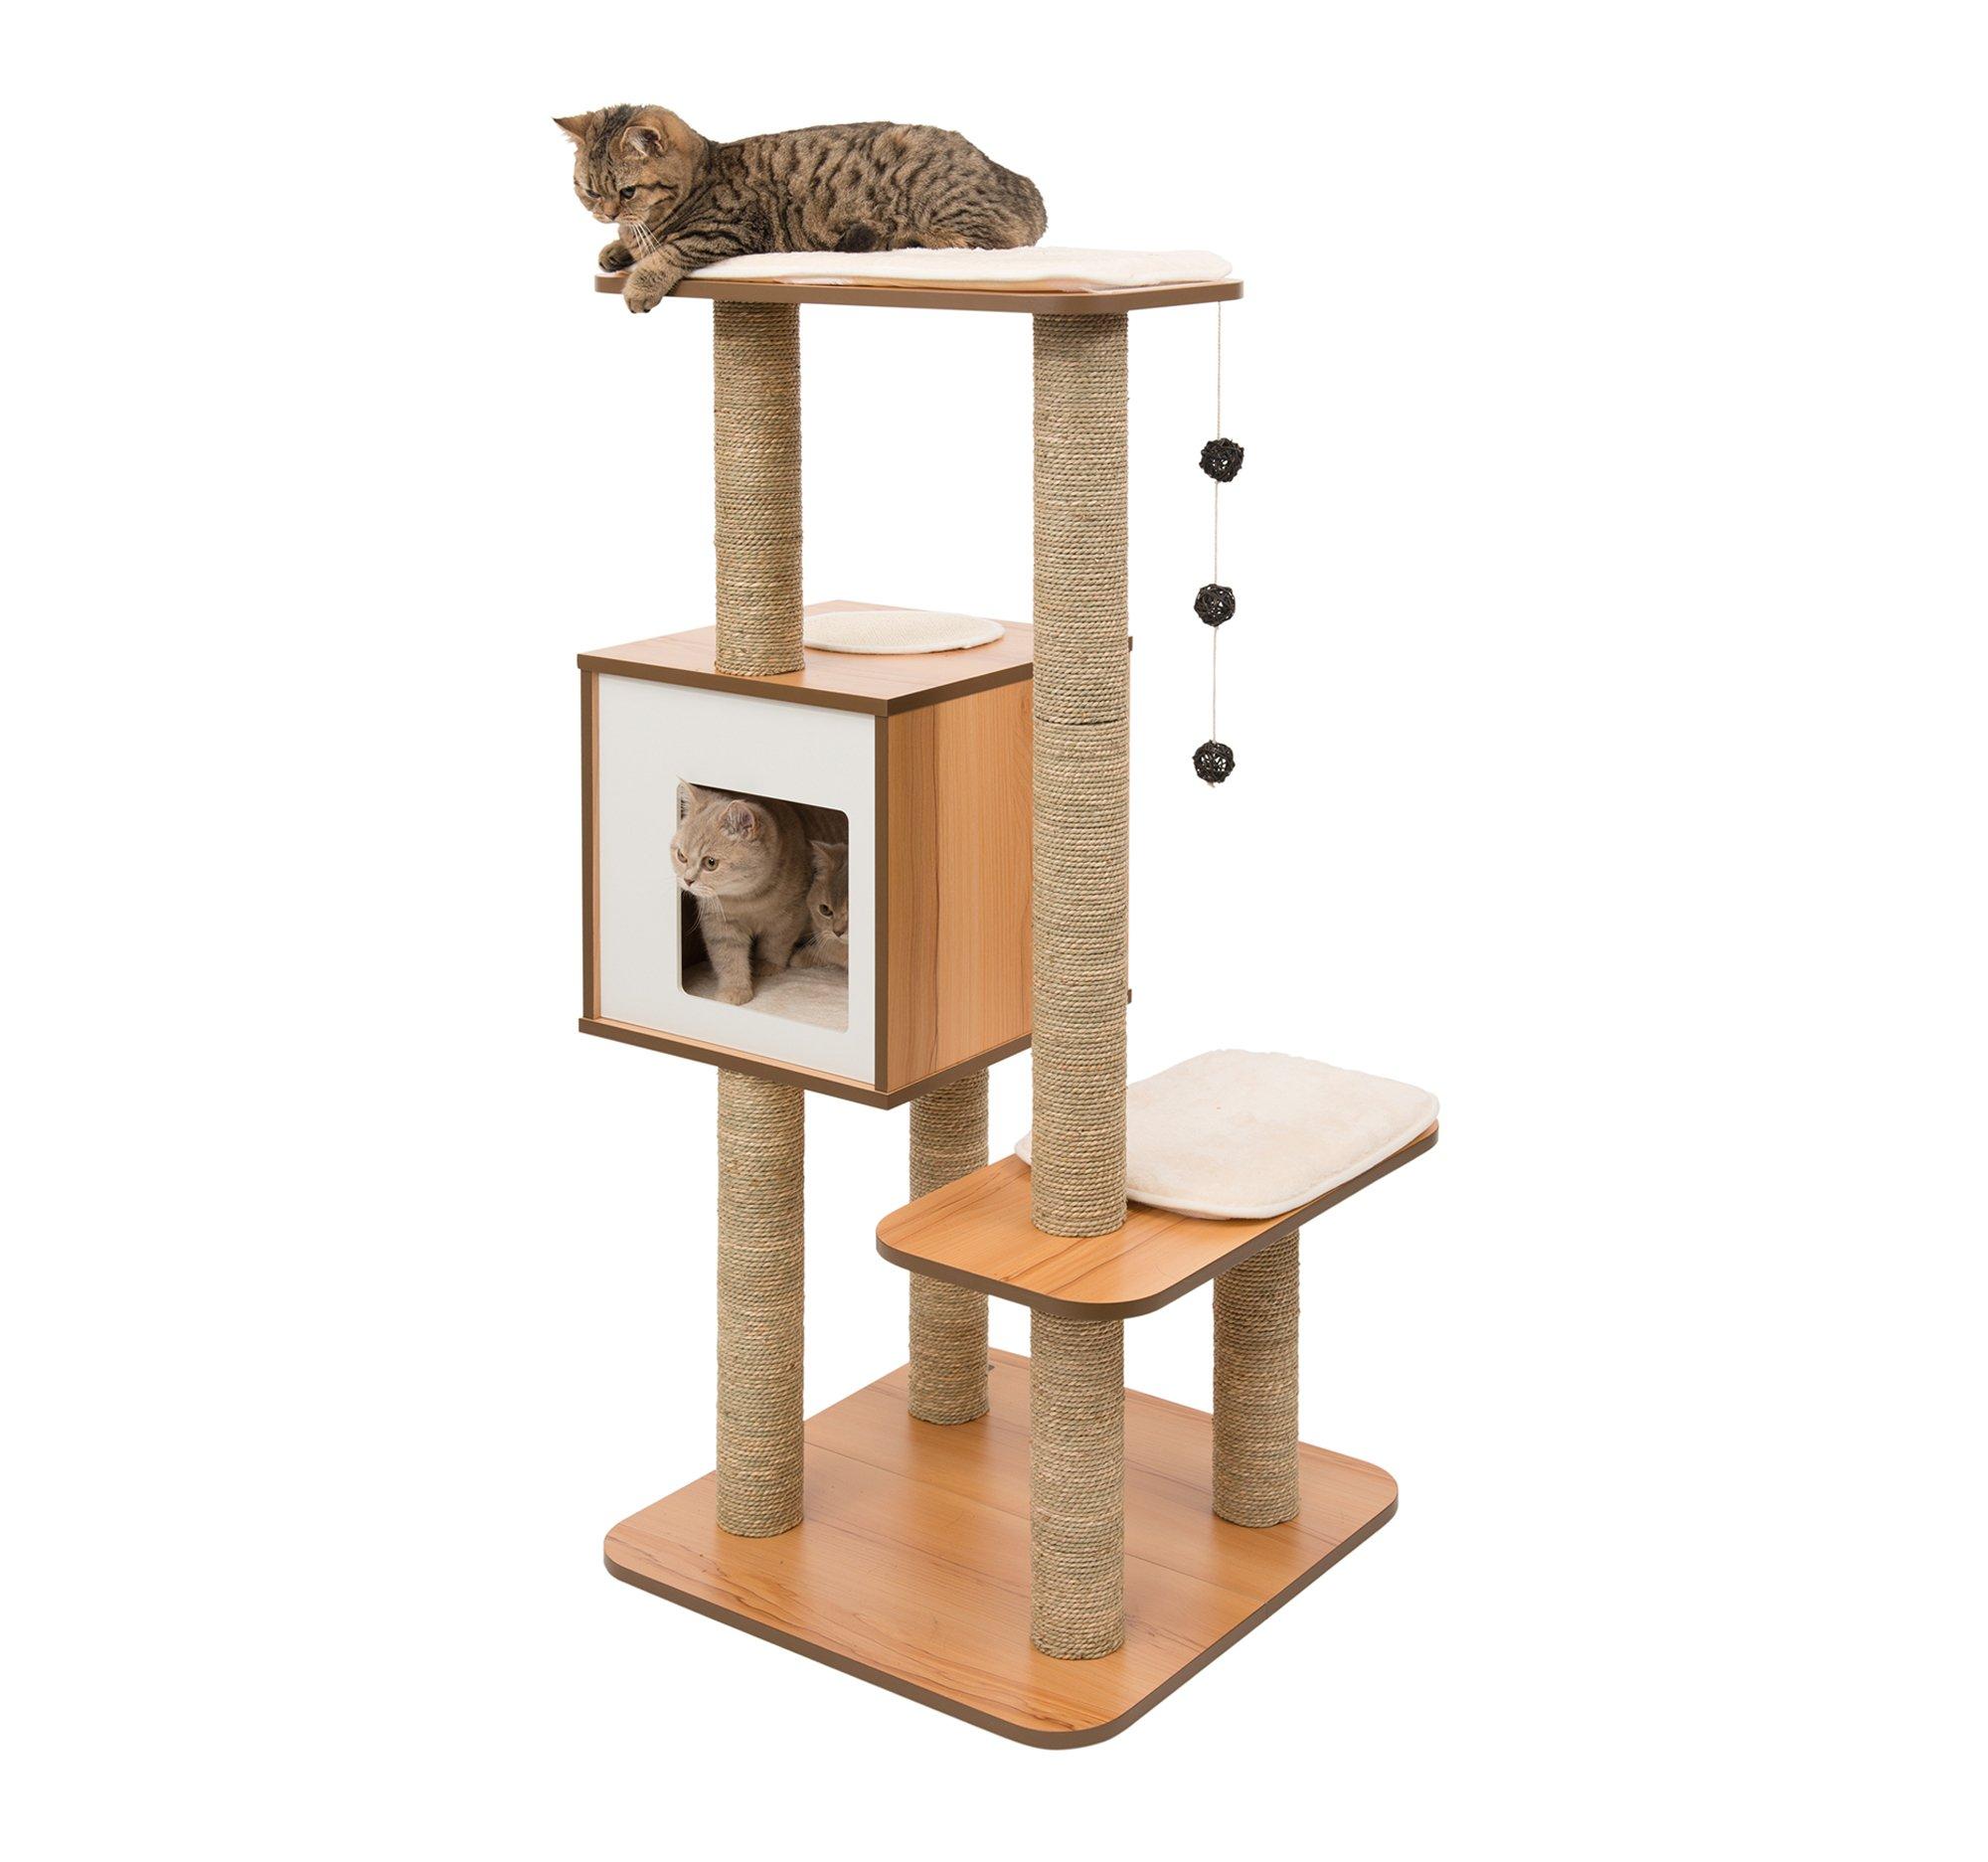 Vesper Cat Tree Scratching Post with Condo - Walnut Furniture by Vesper